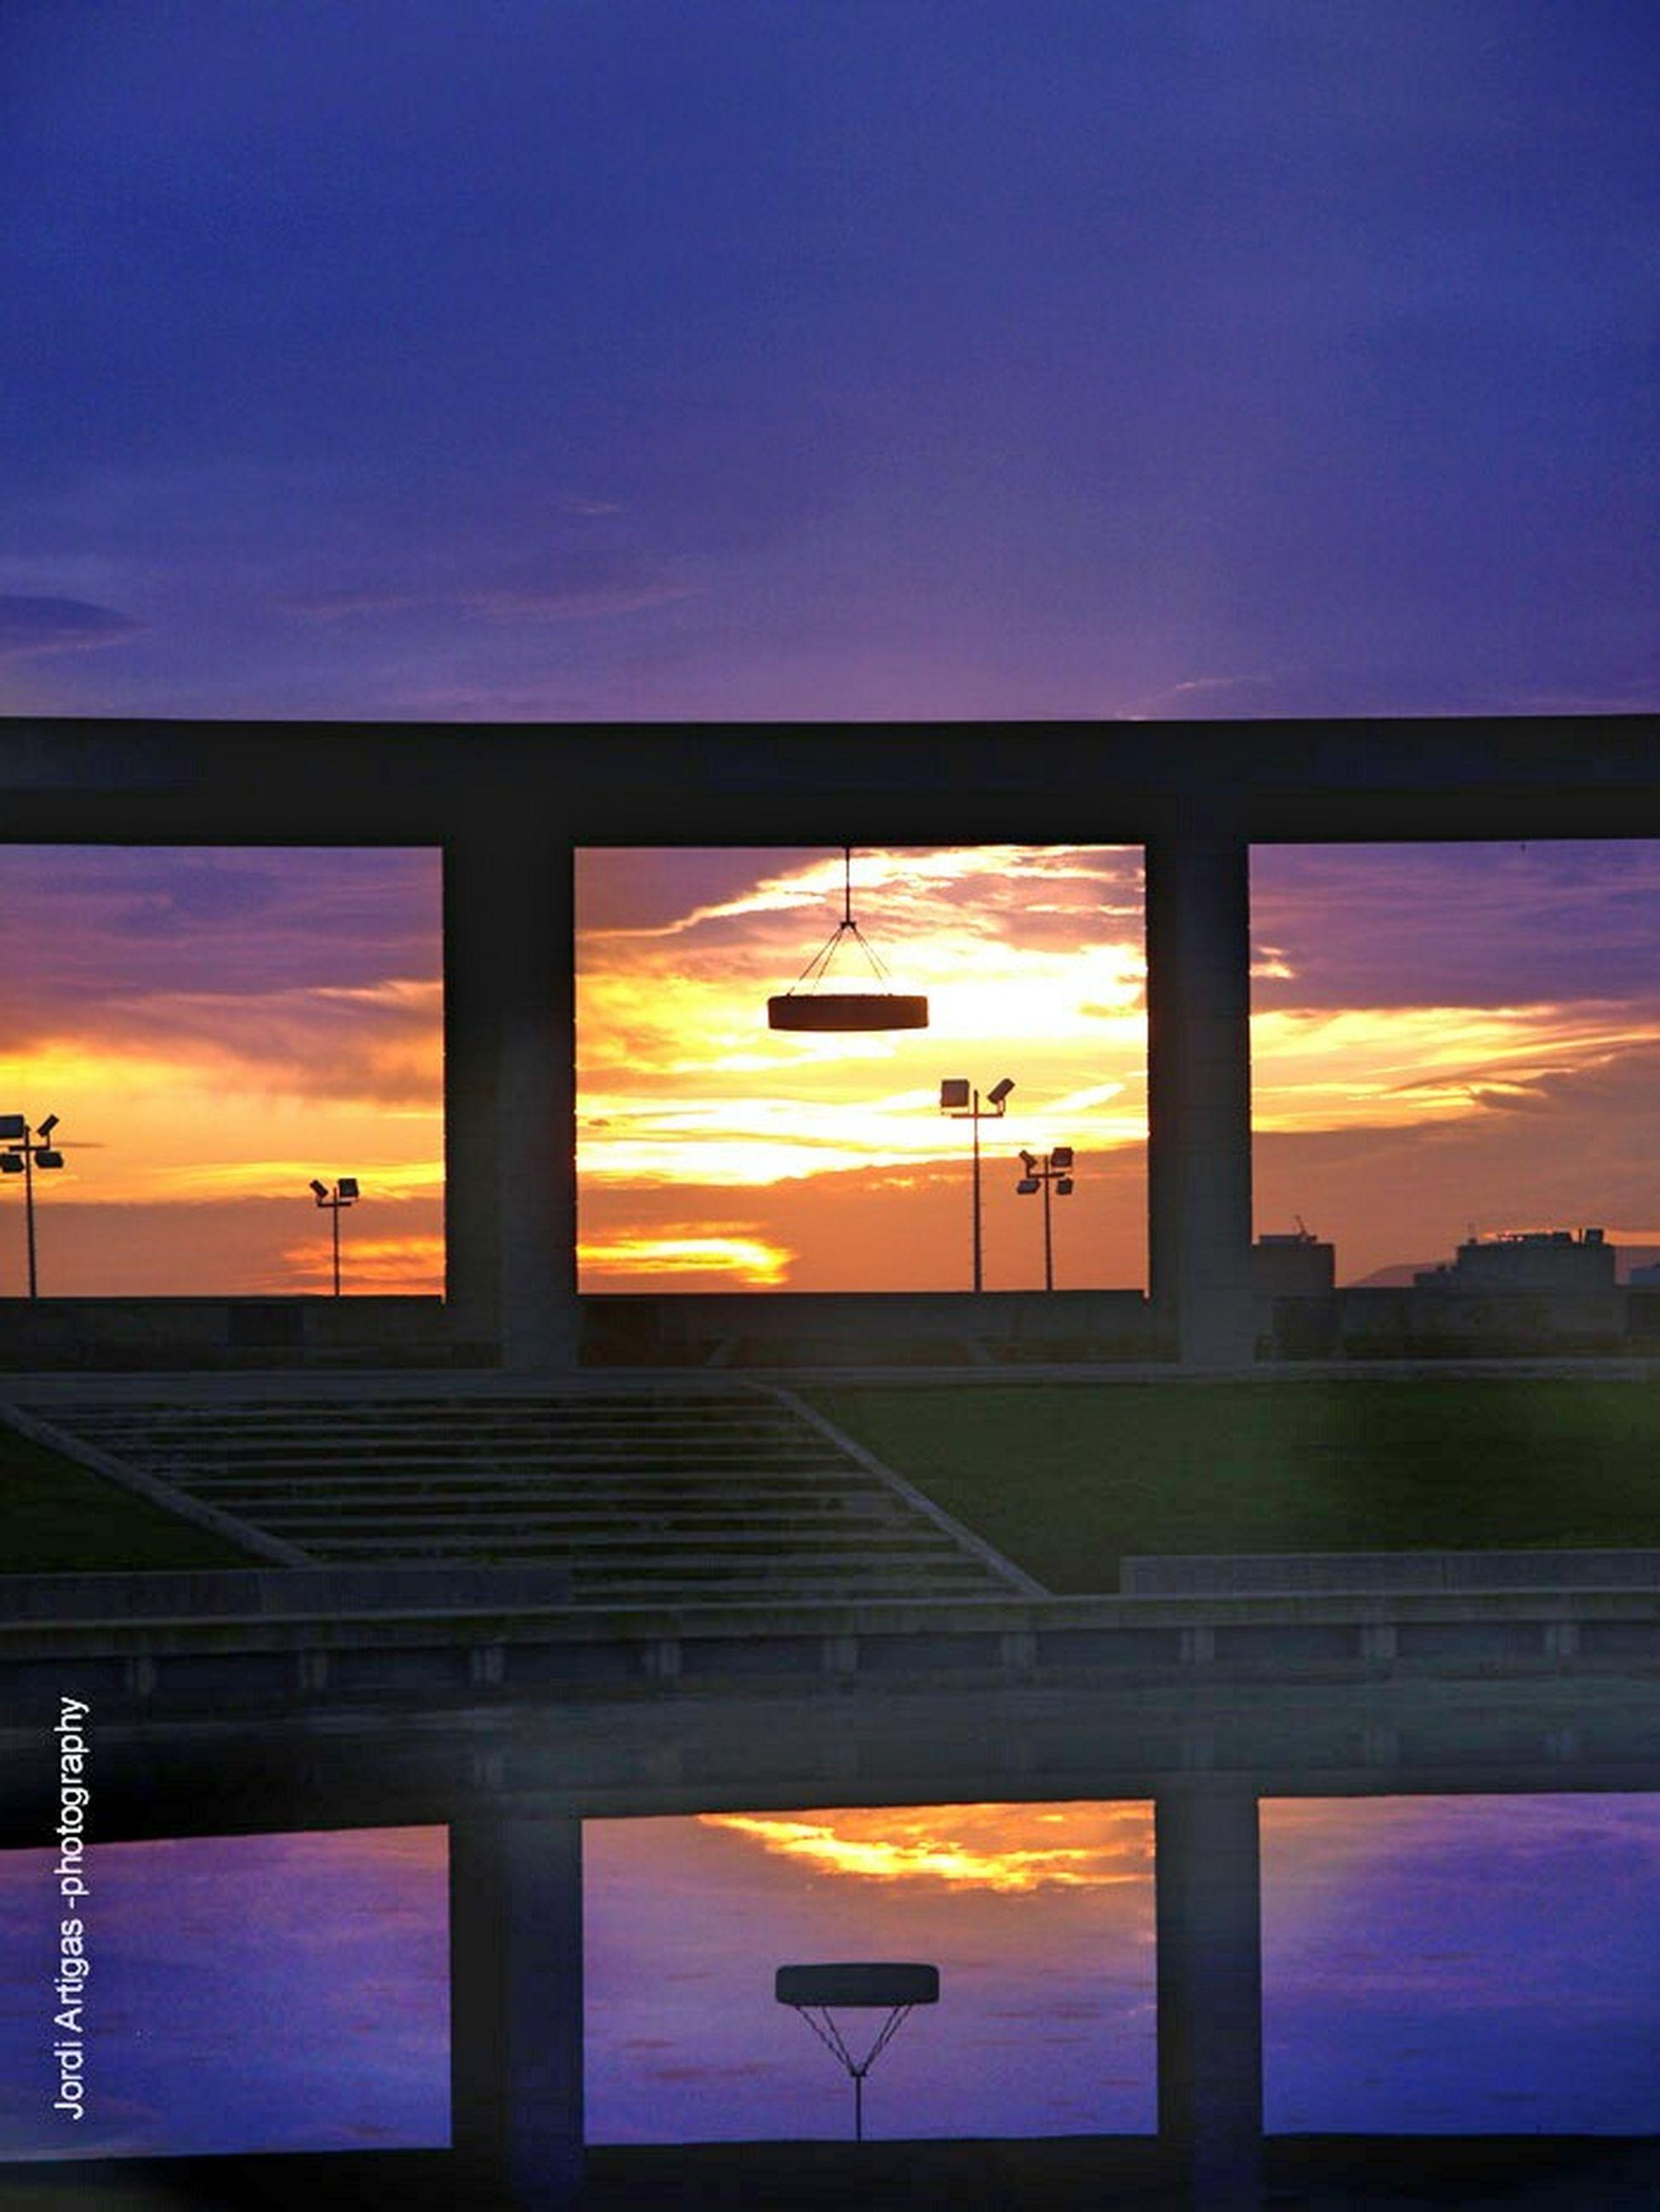 sunset, sky, built structure, architecture, cloud - sky, orange color, cloud, yellow, blue, low angle view, transportation, silhouette, outdoors, dusk, illuminated, no people, railing, building exterior, bridge - man made structure, sunlight